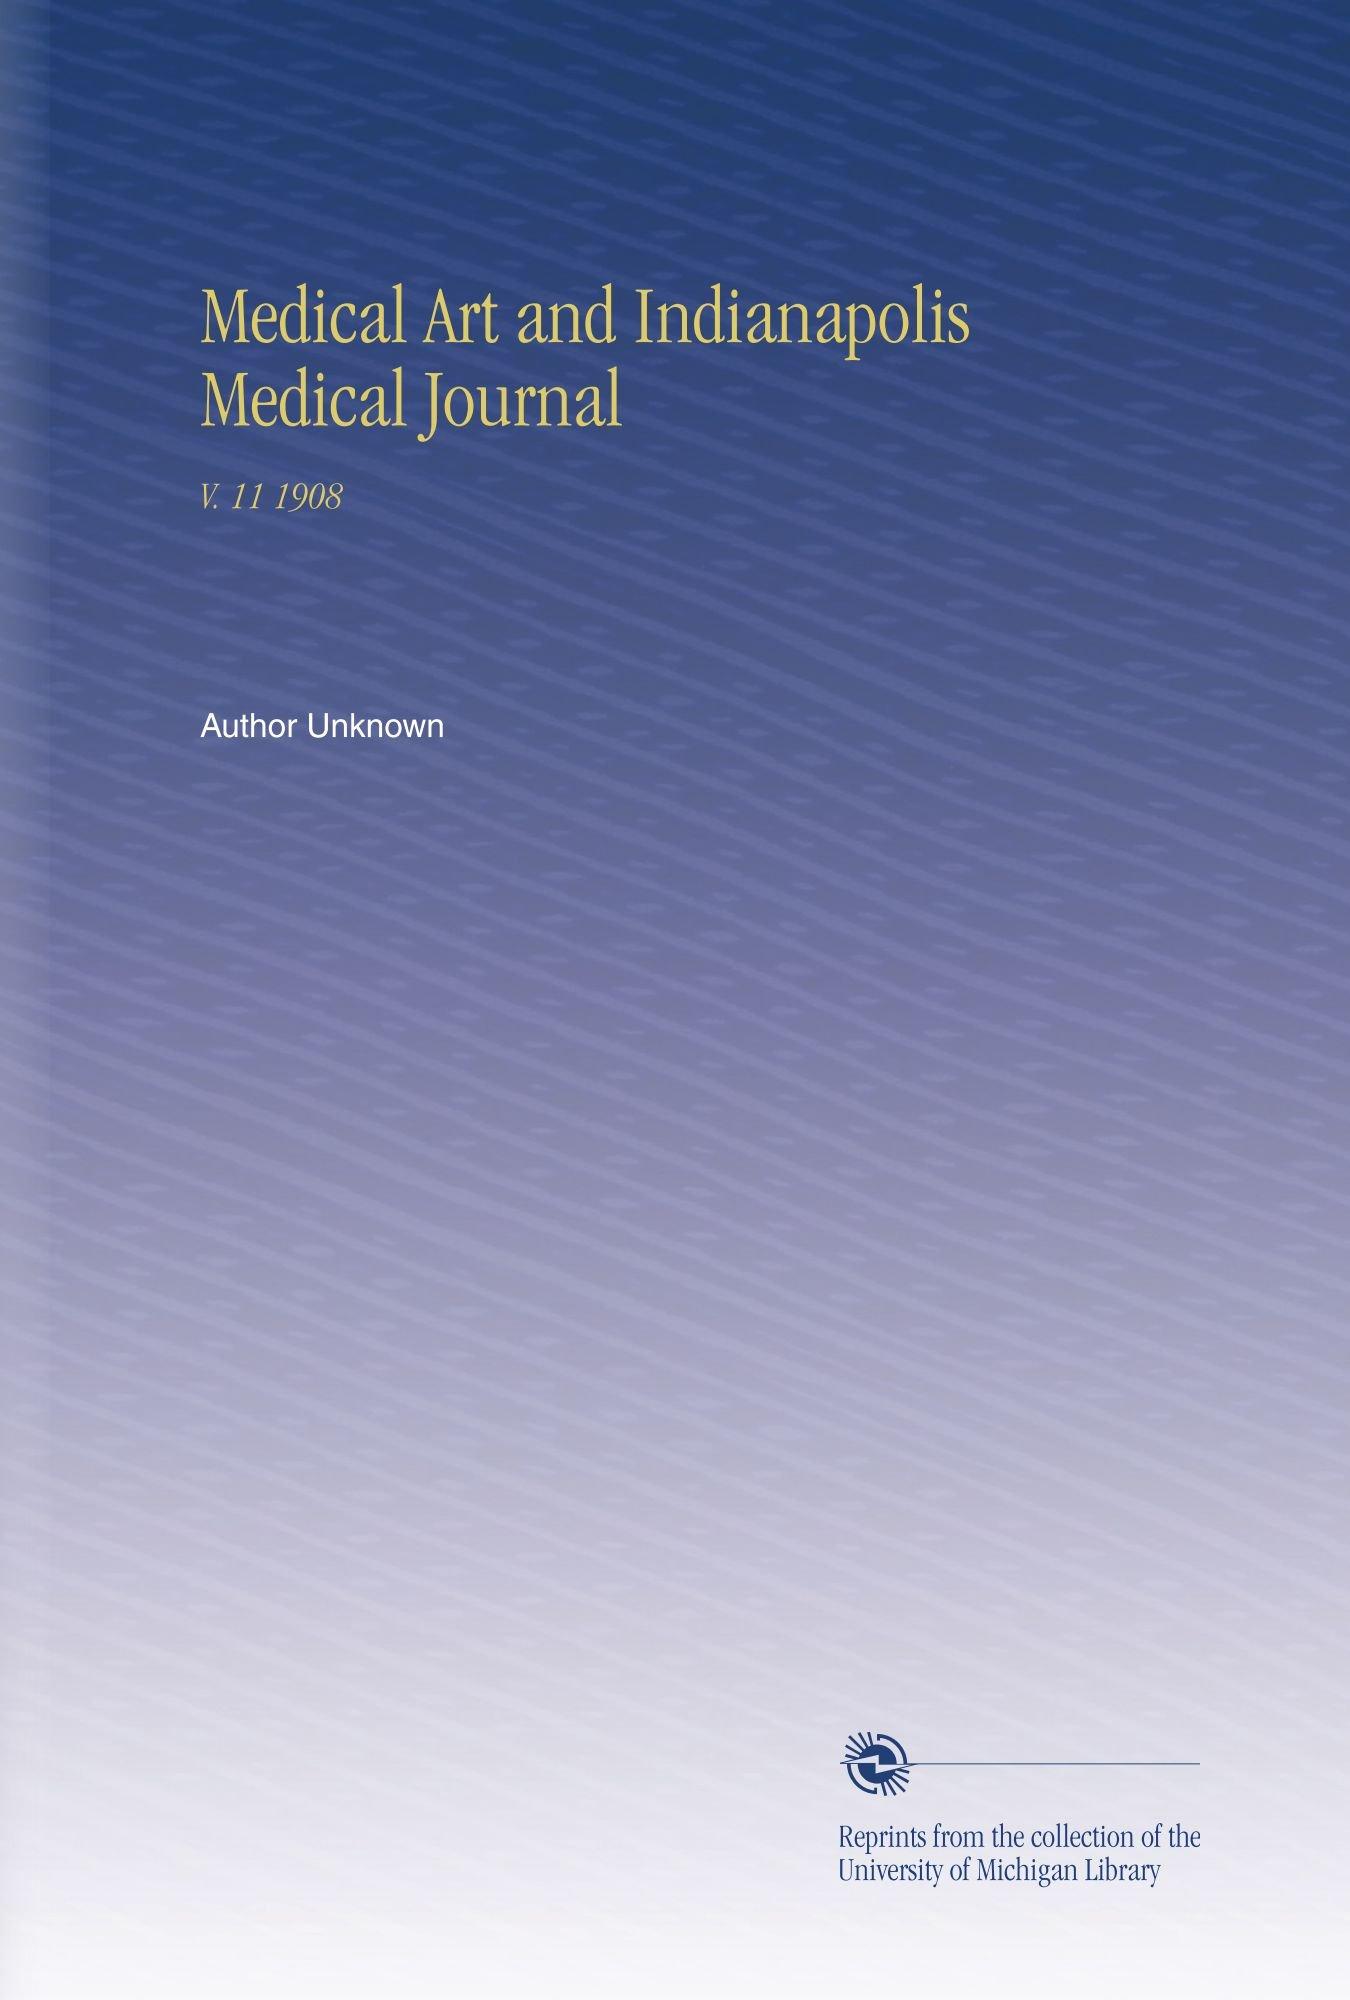 Read Online Medical Art and Indianapolis Medical Journal: V. 11 1908 pdf